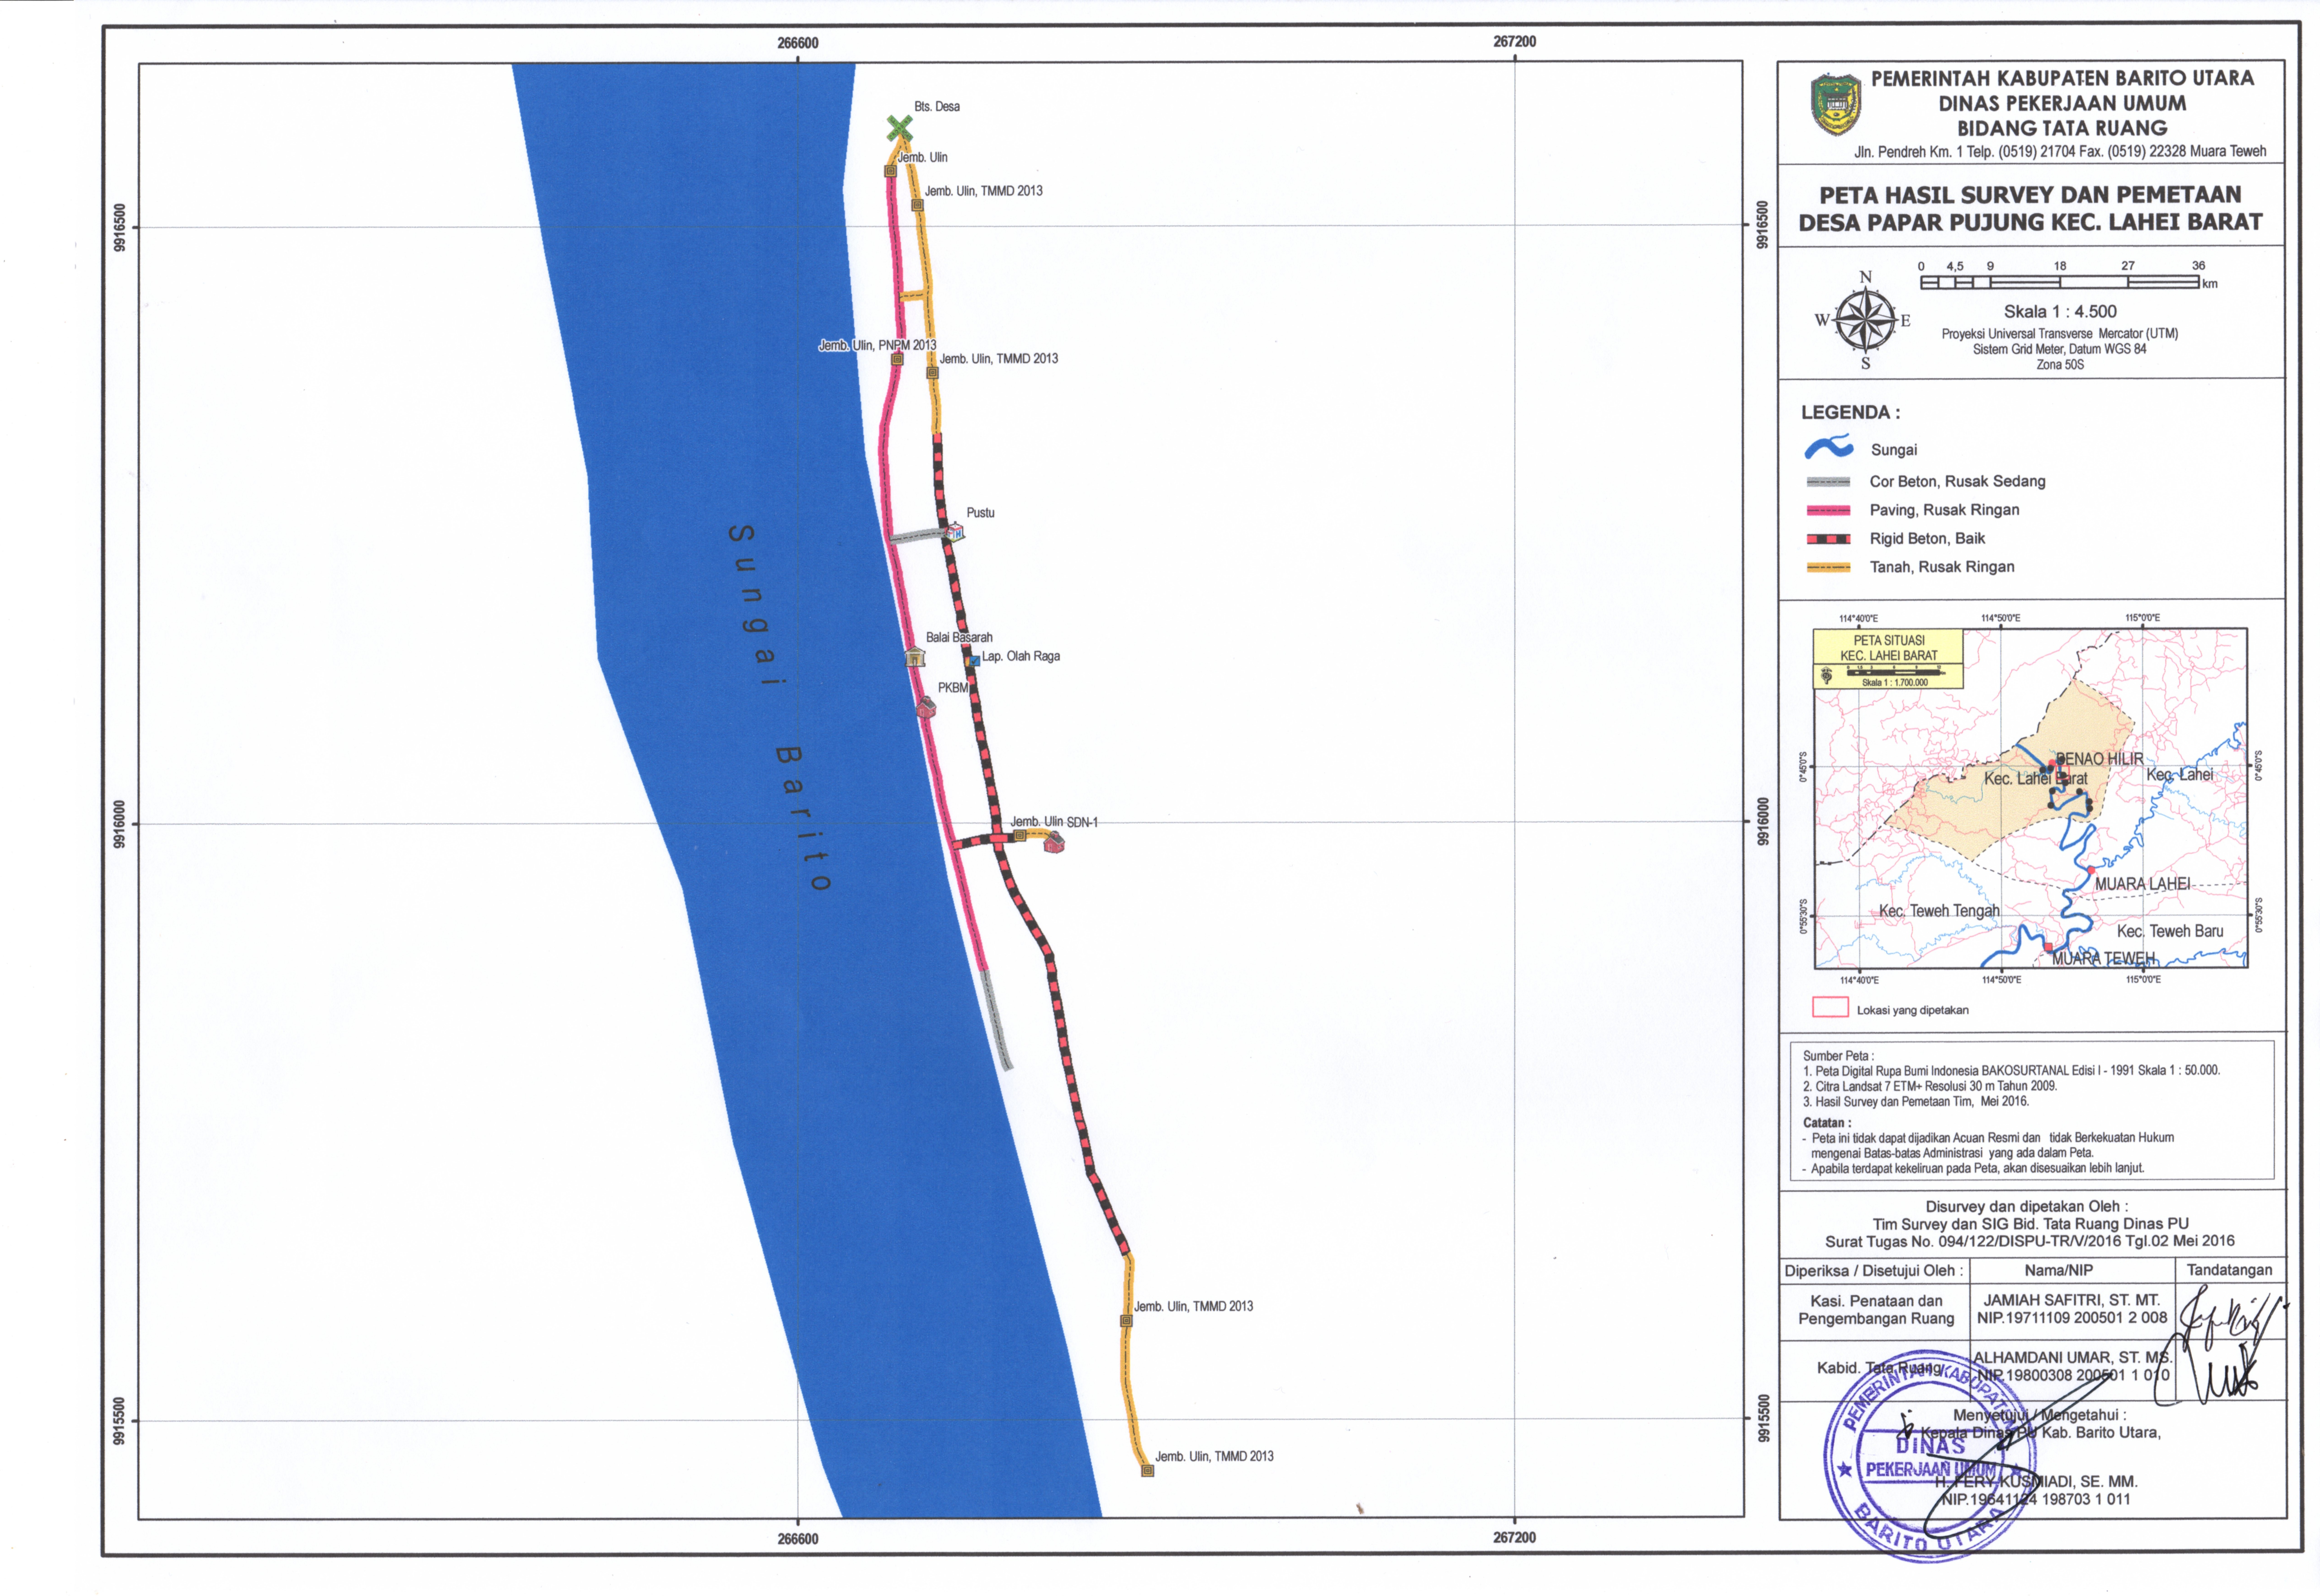 Ds_Papar Pujung - Bappeda Barito Utara